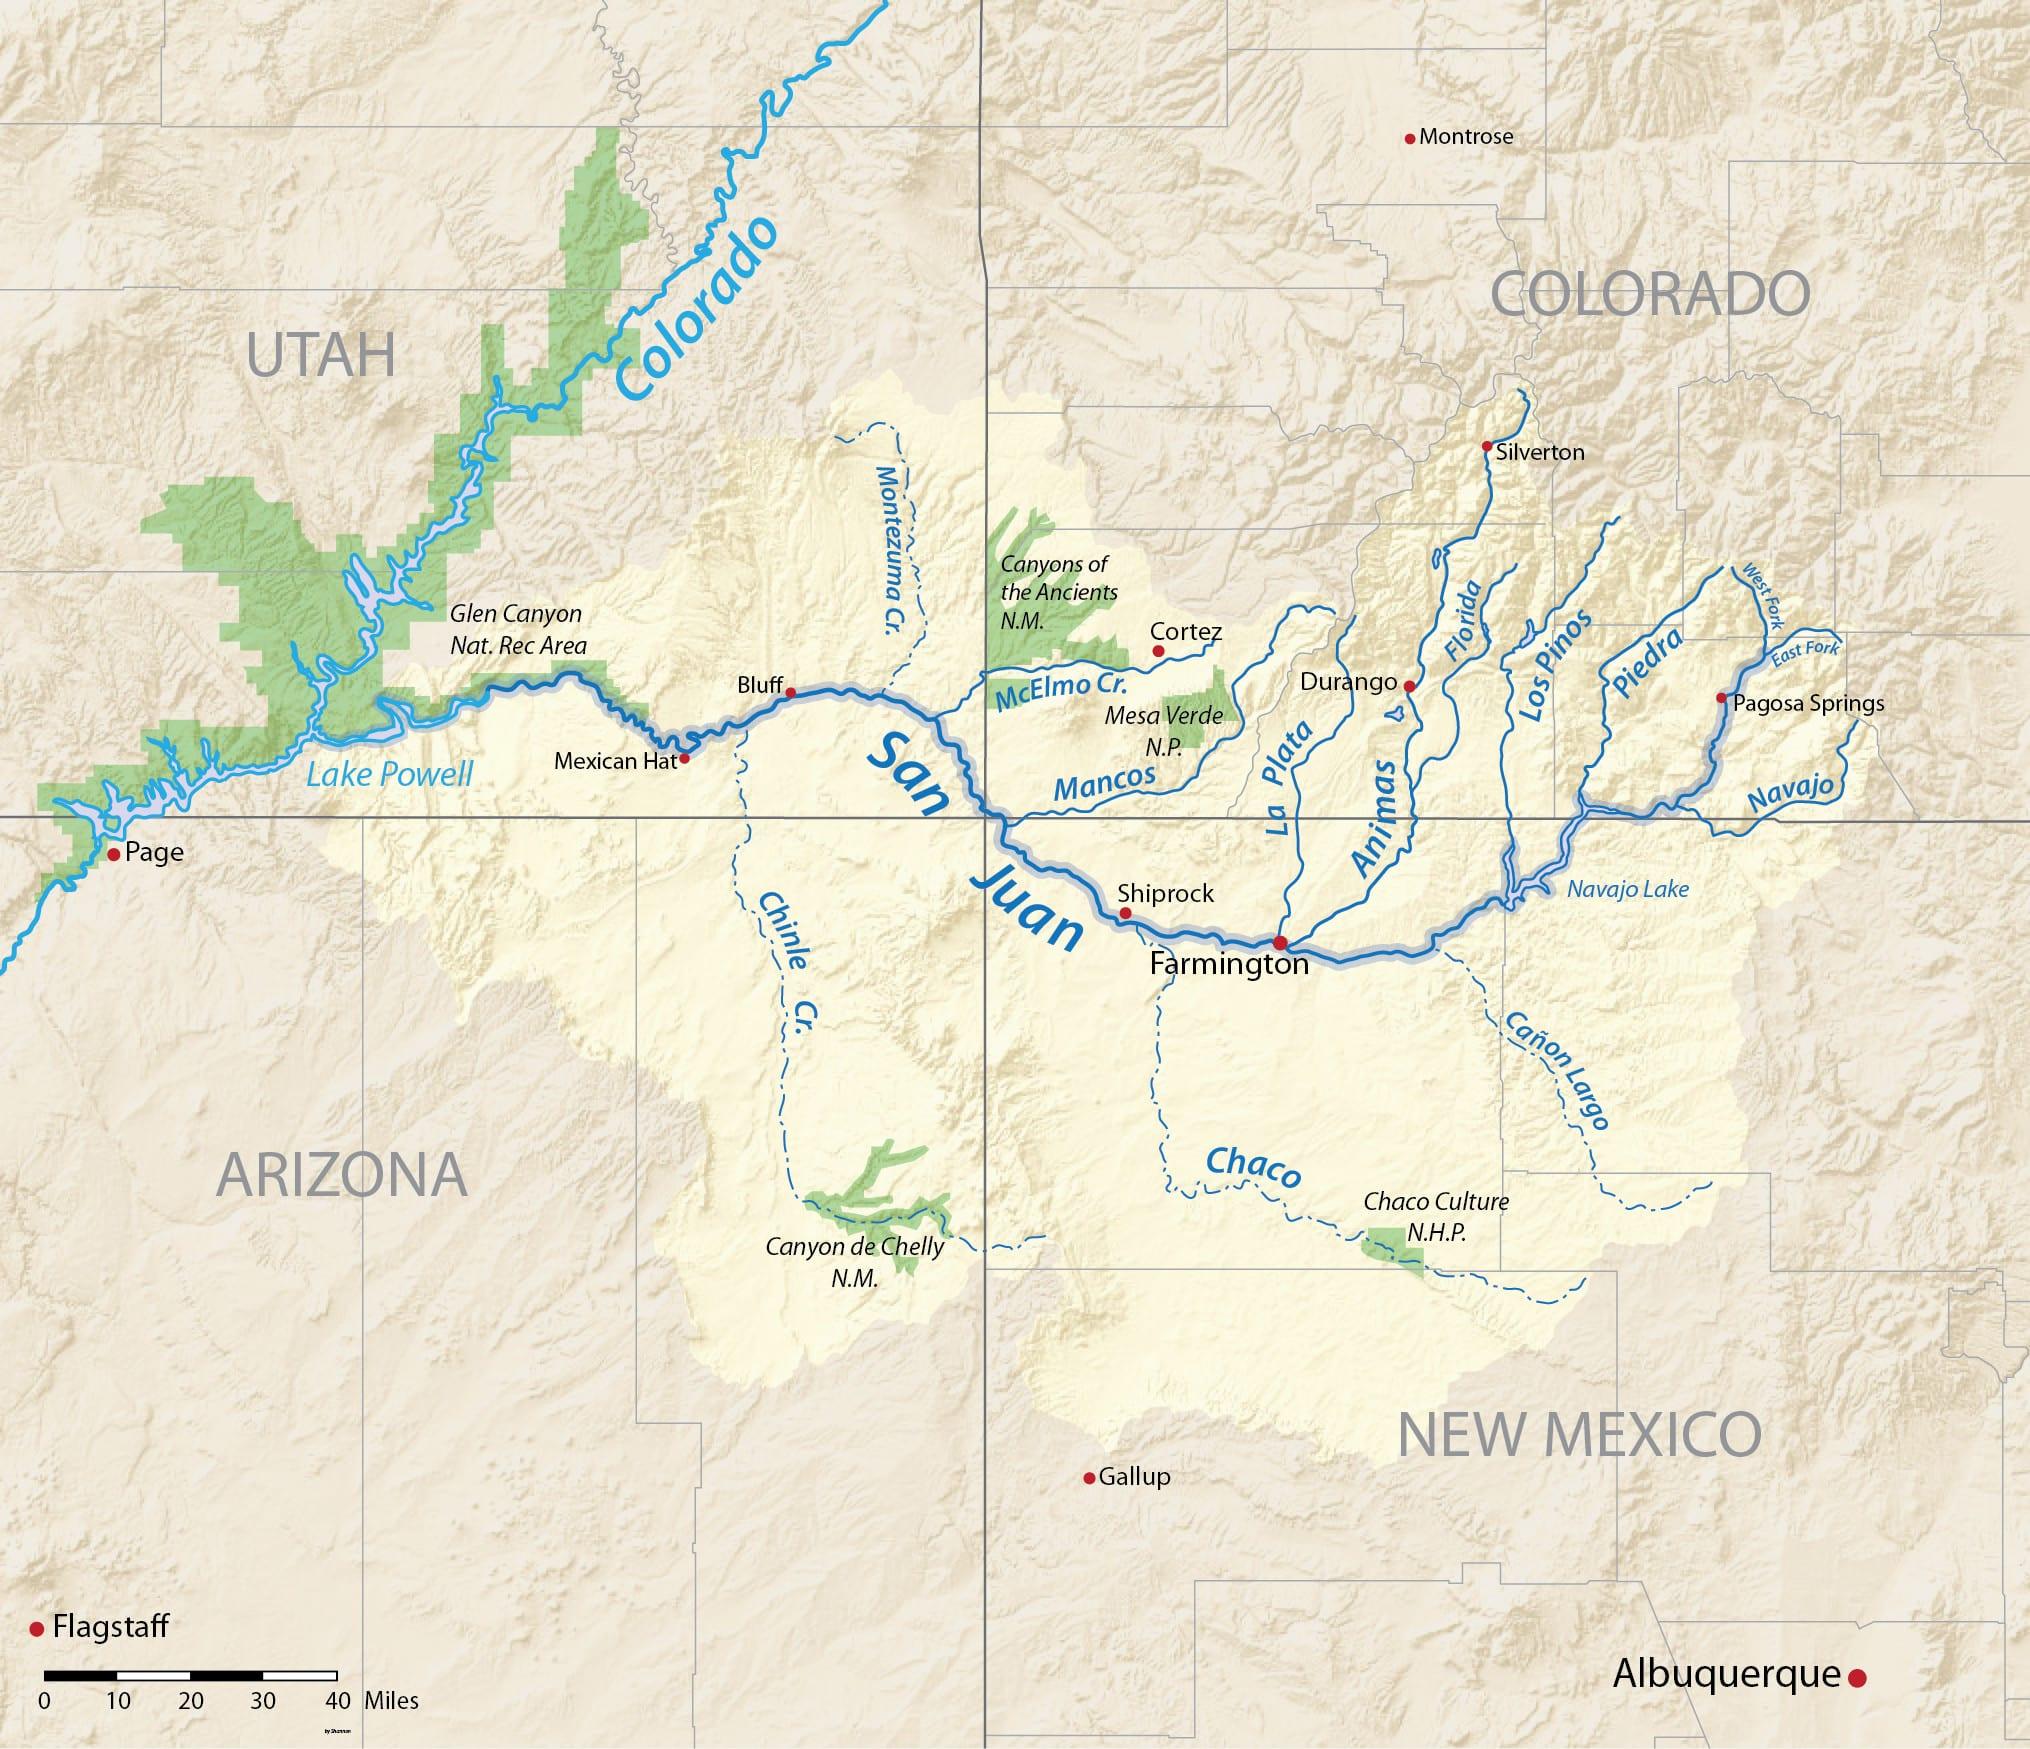 San Juan River Drainage Basin Map